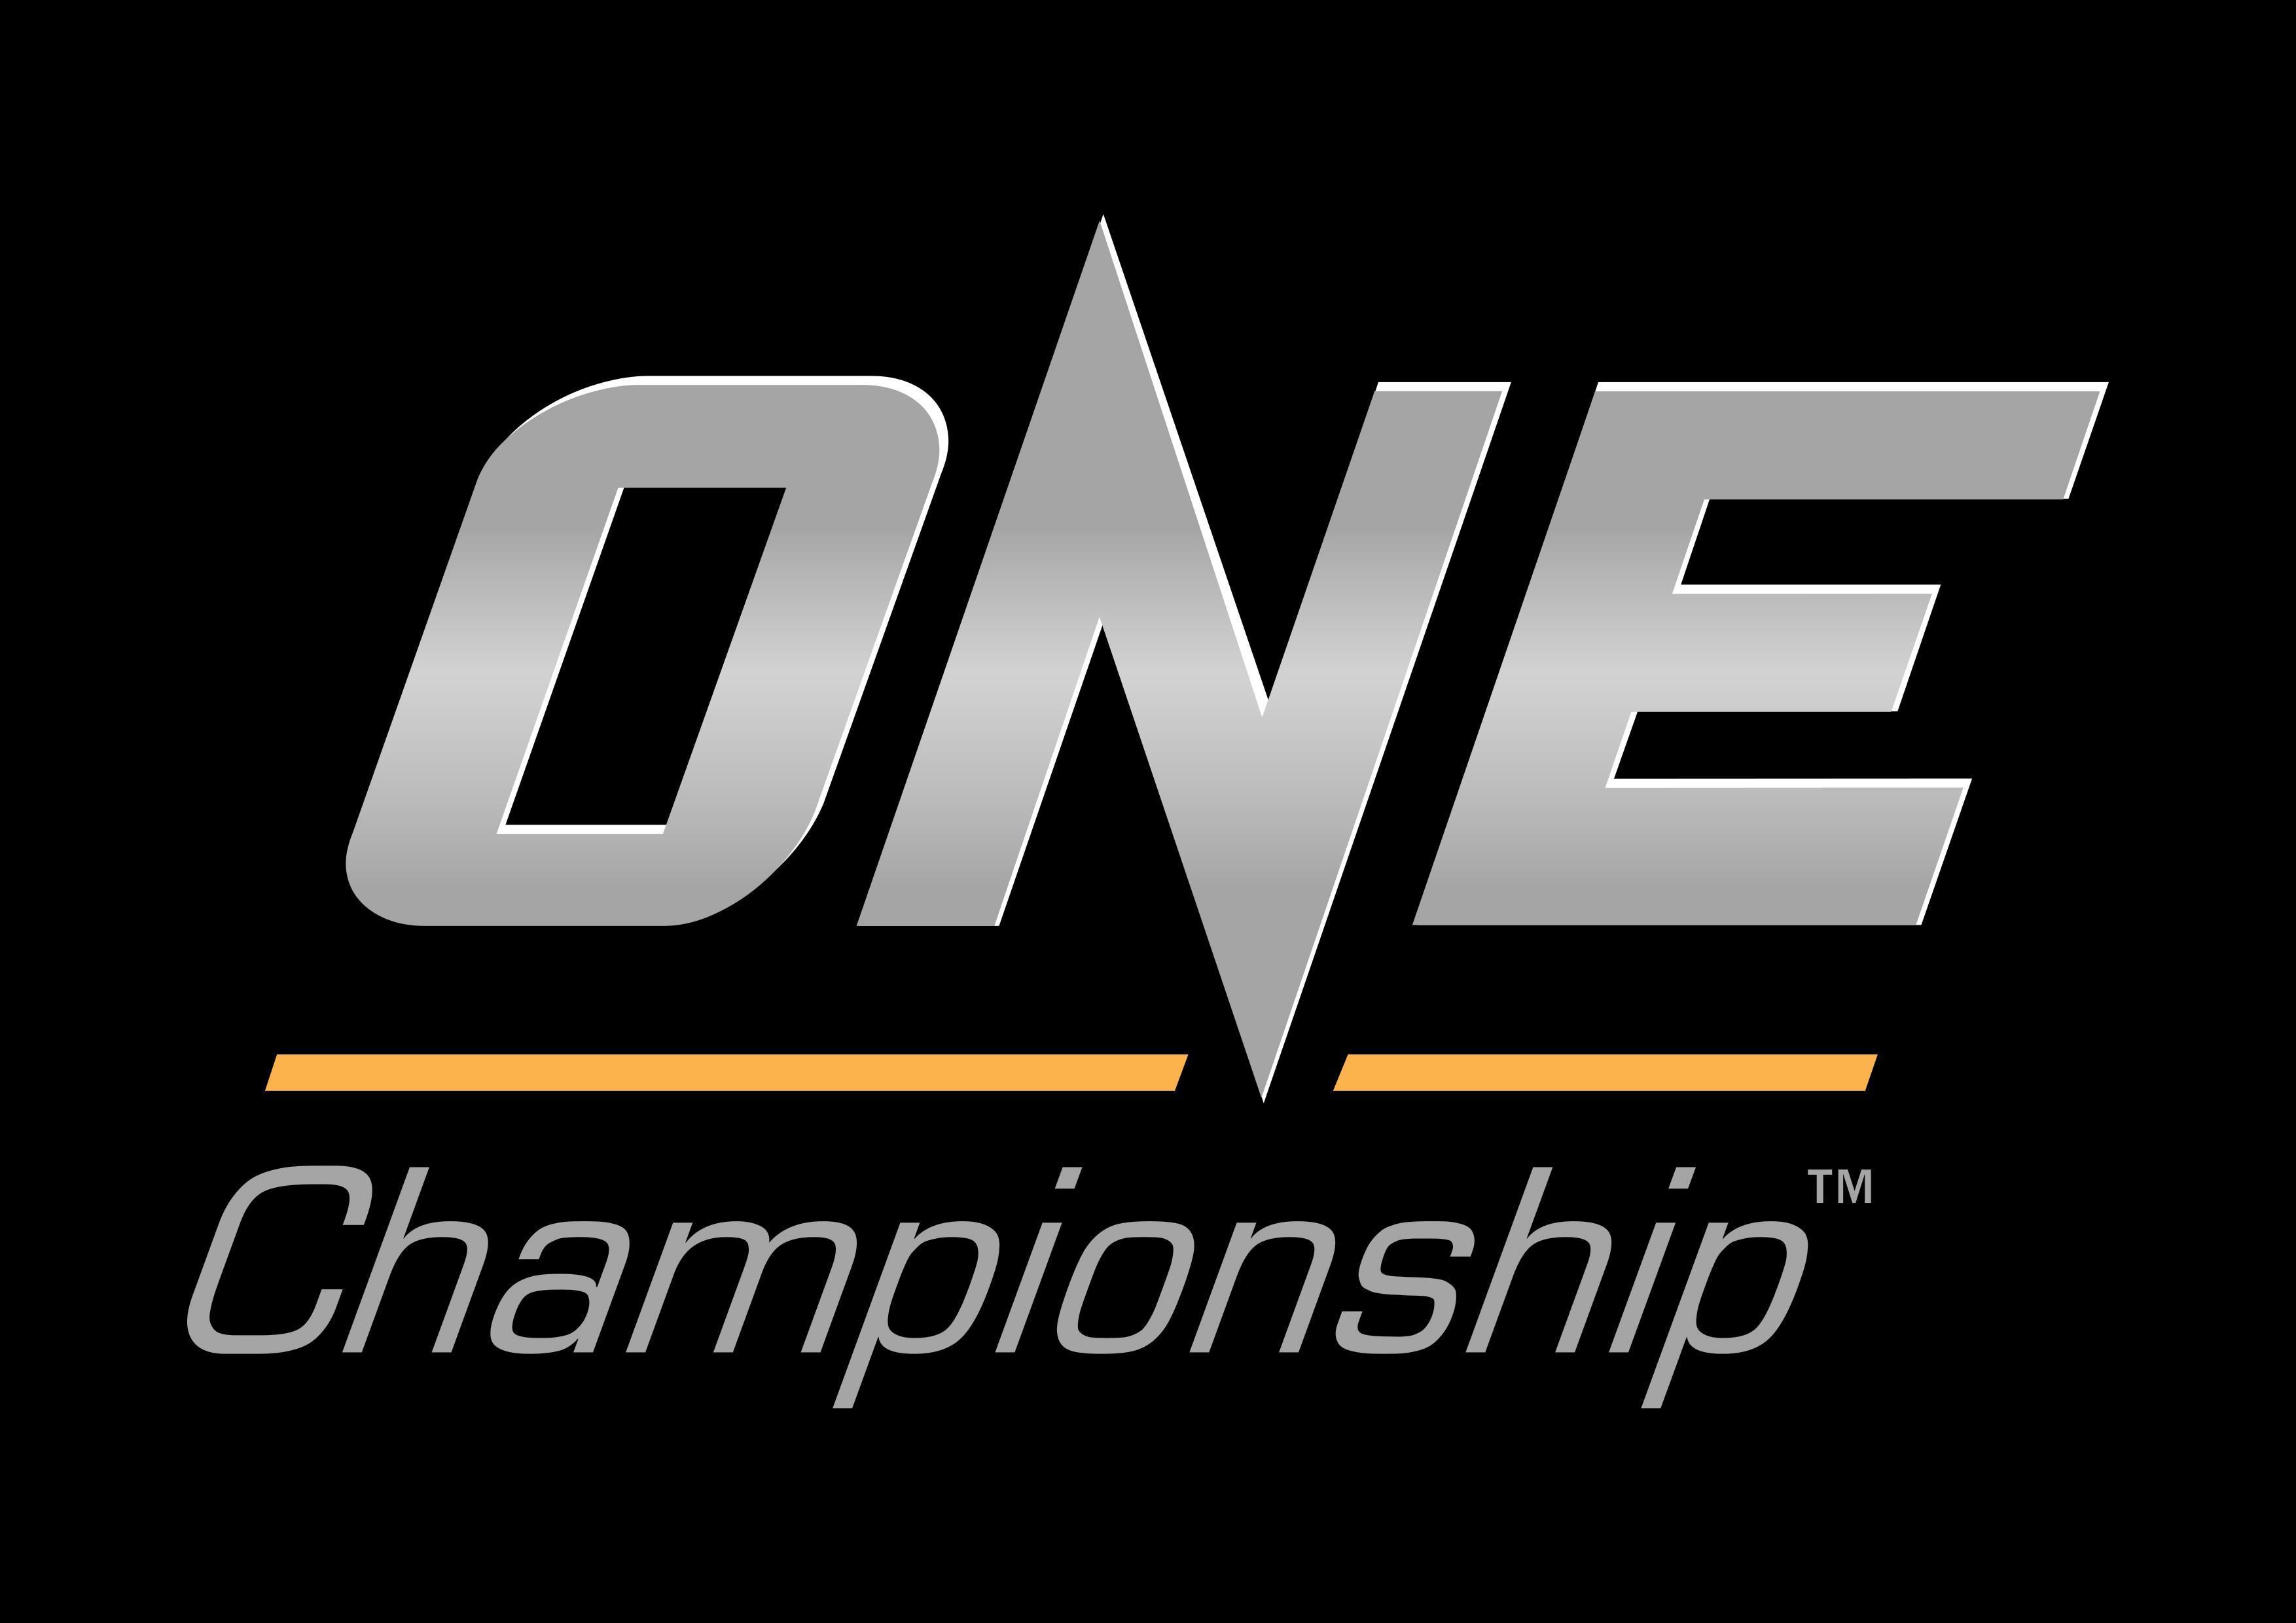 MMA Organization One Championship to Invest $50M in Esports - Hotspawn.com